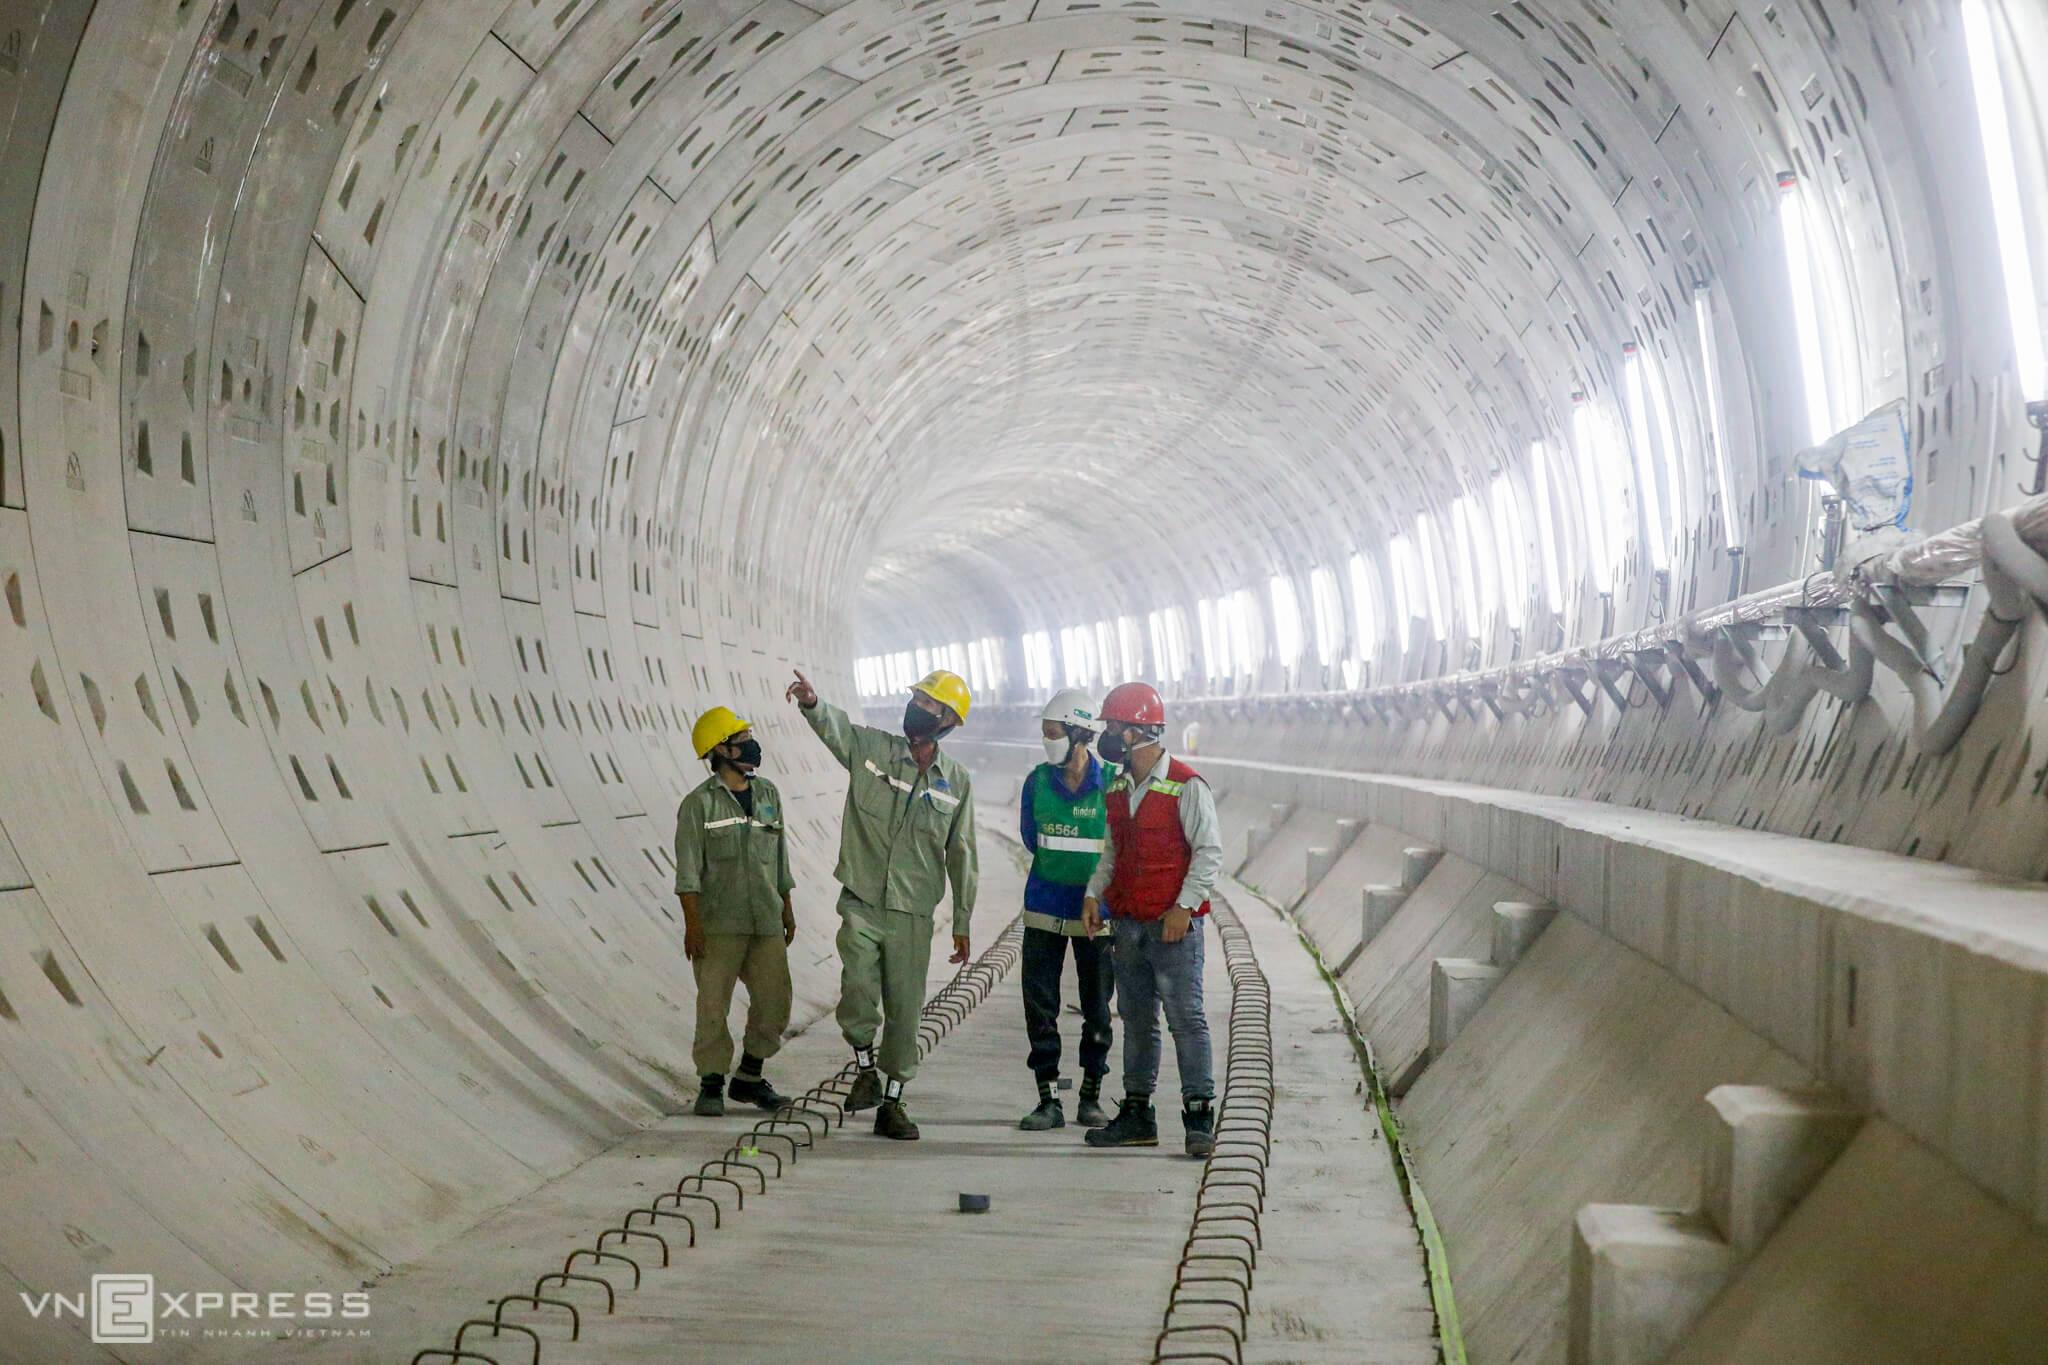 Saigon metro workers keep going despite sun, pandemic